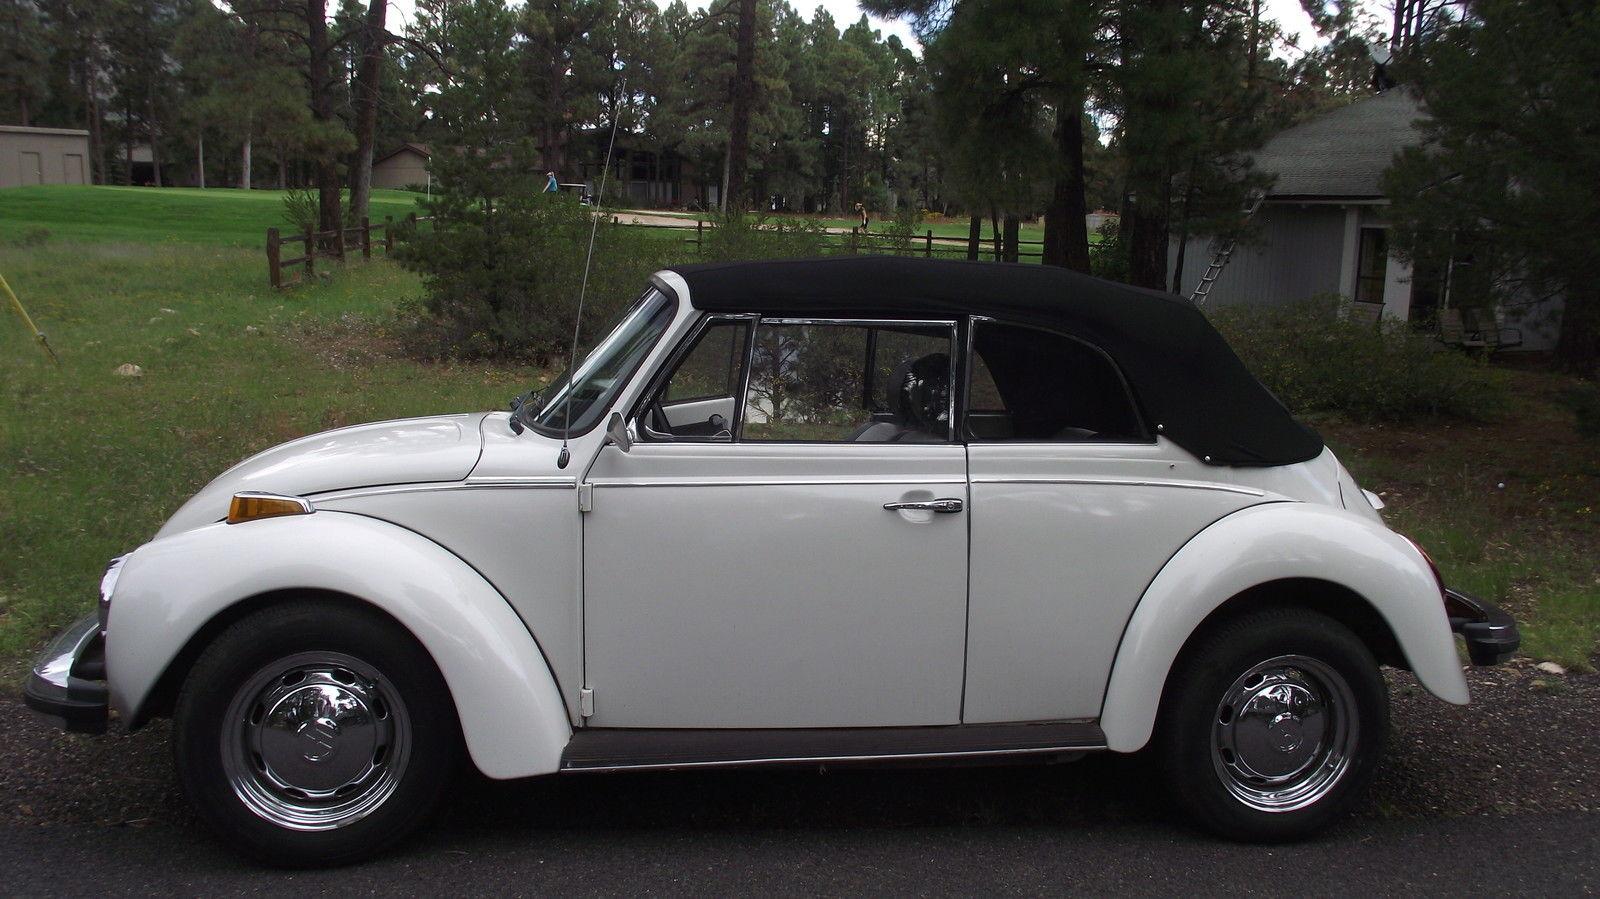 1979 Volkswagen Super Beetle Karmann Edition Convertible